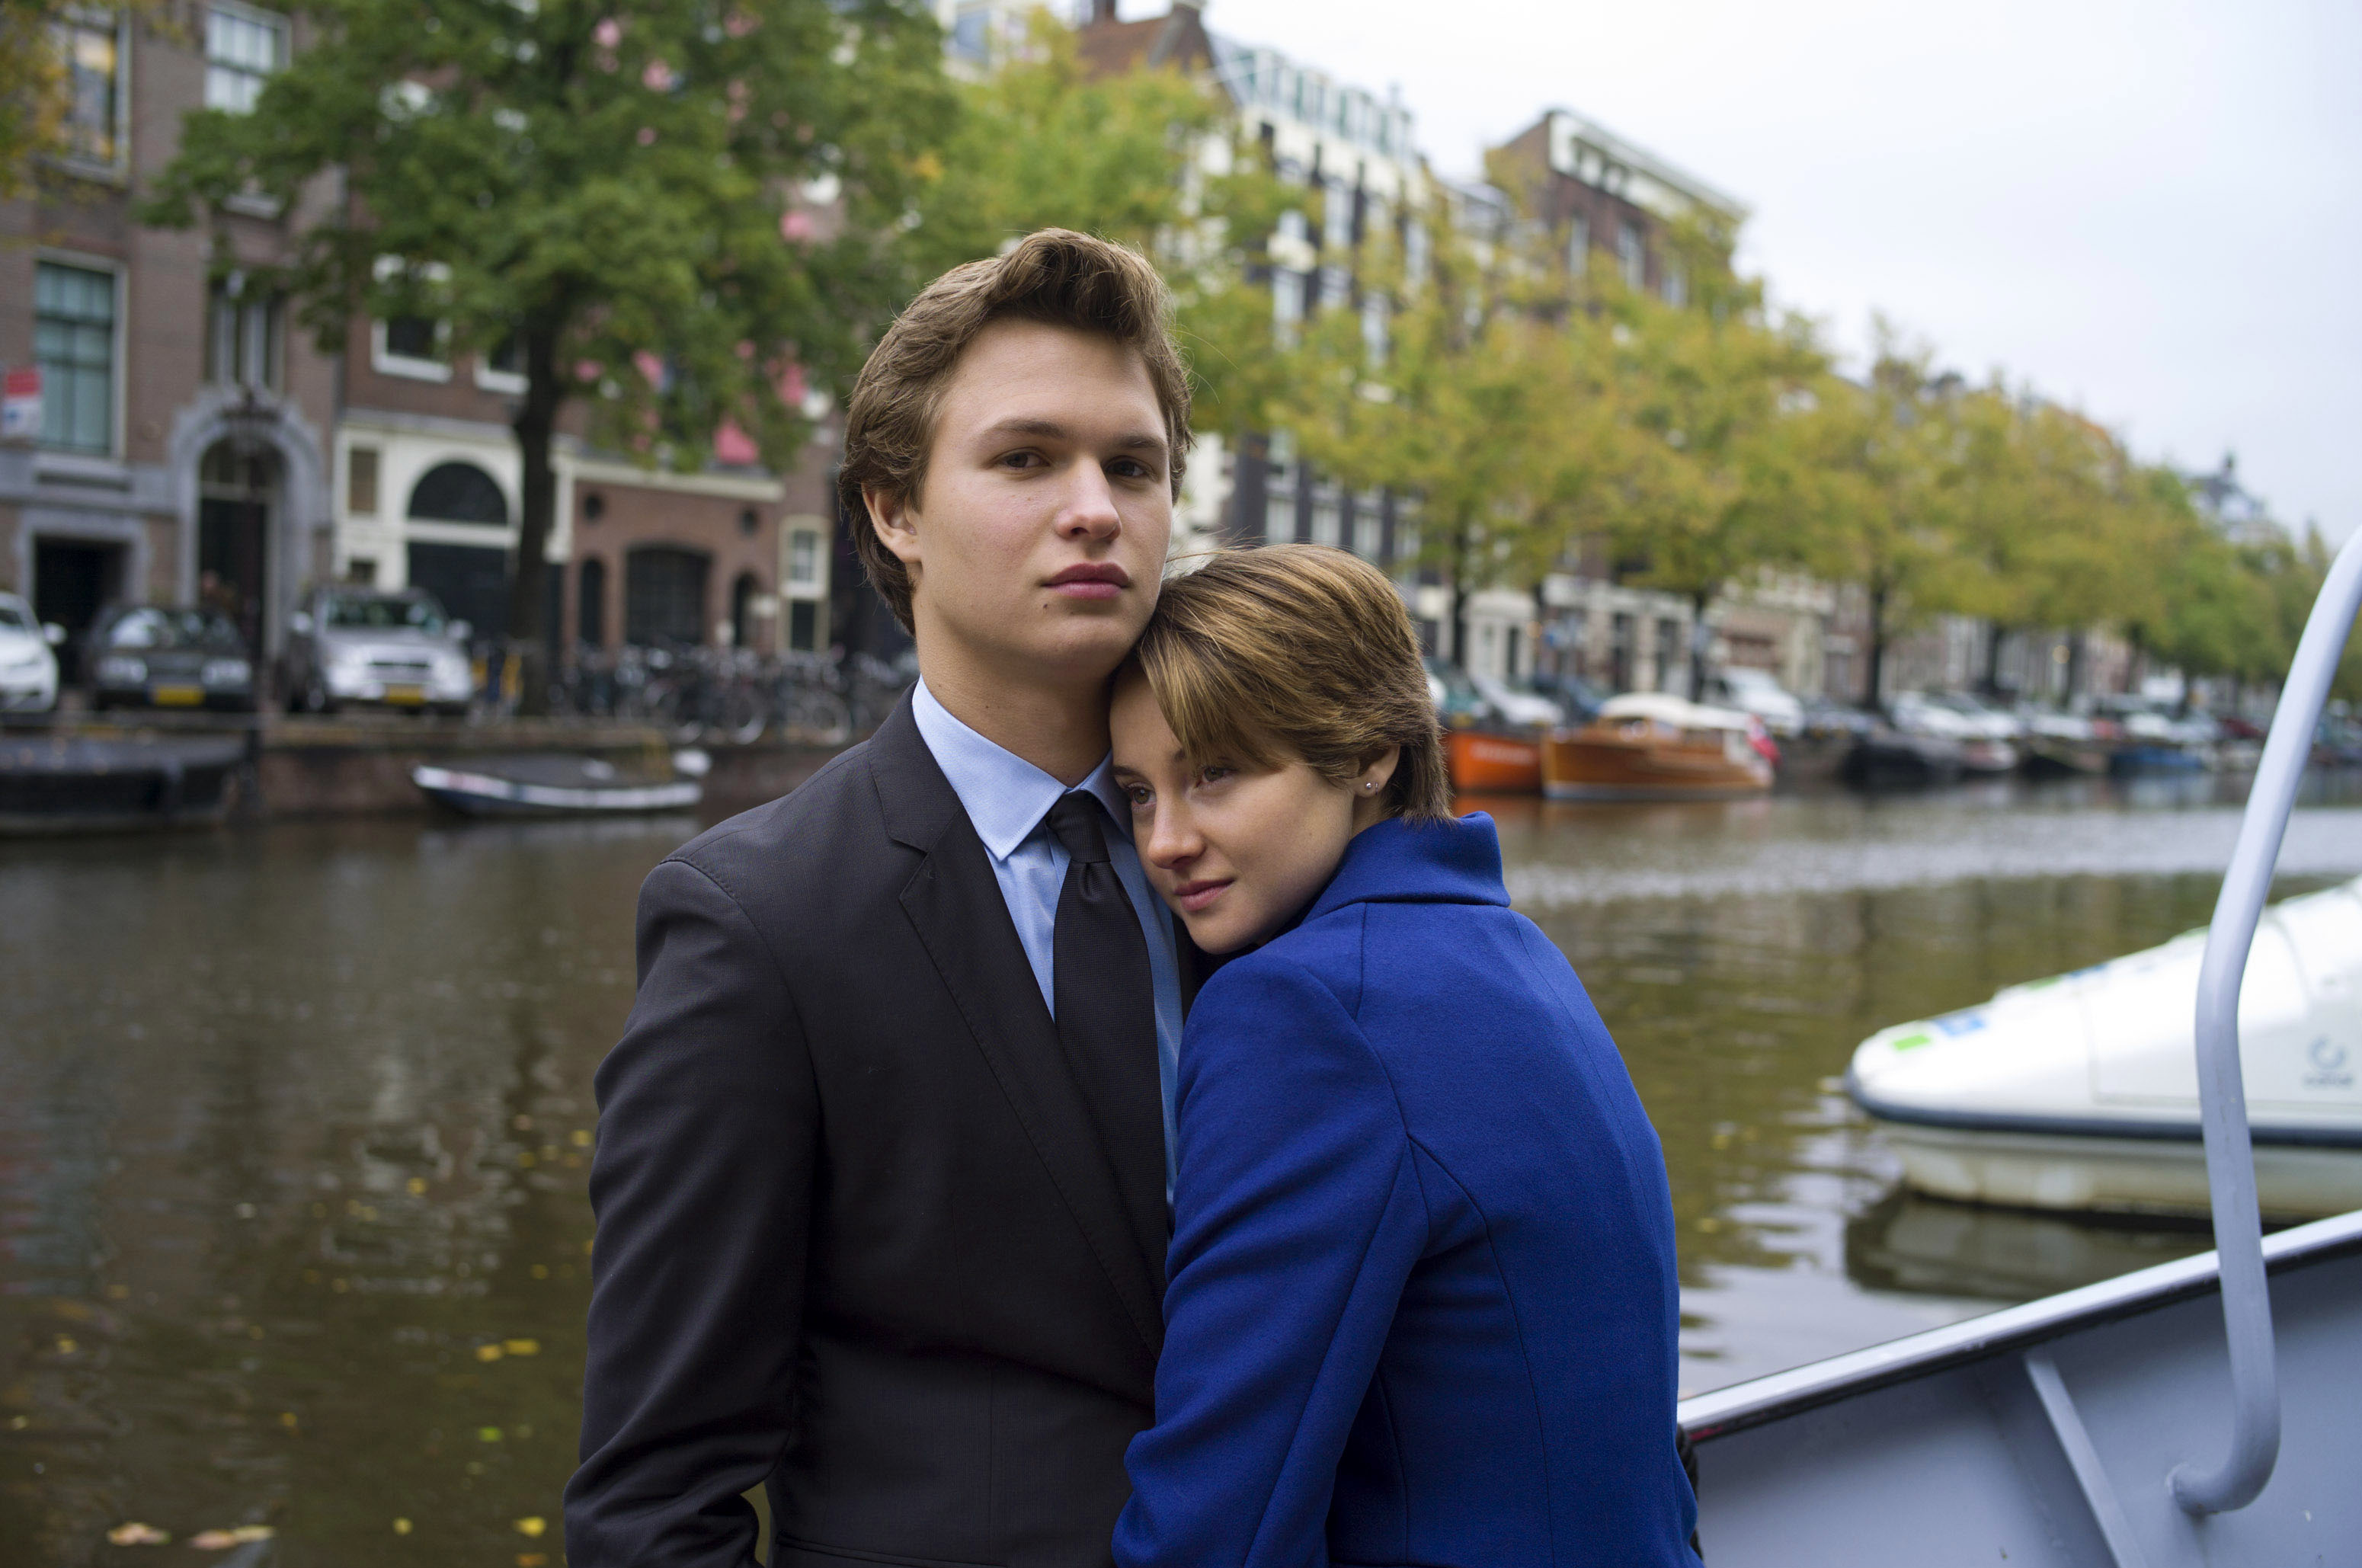 Shailene Woodley kicks Tom Cruise's butt at box office